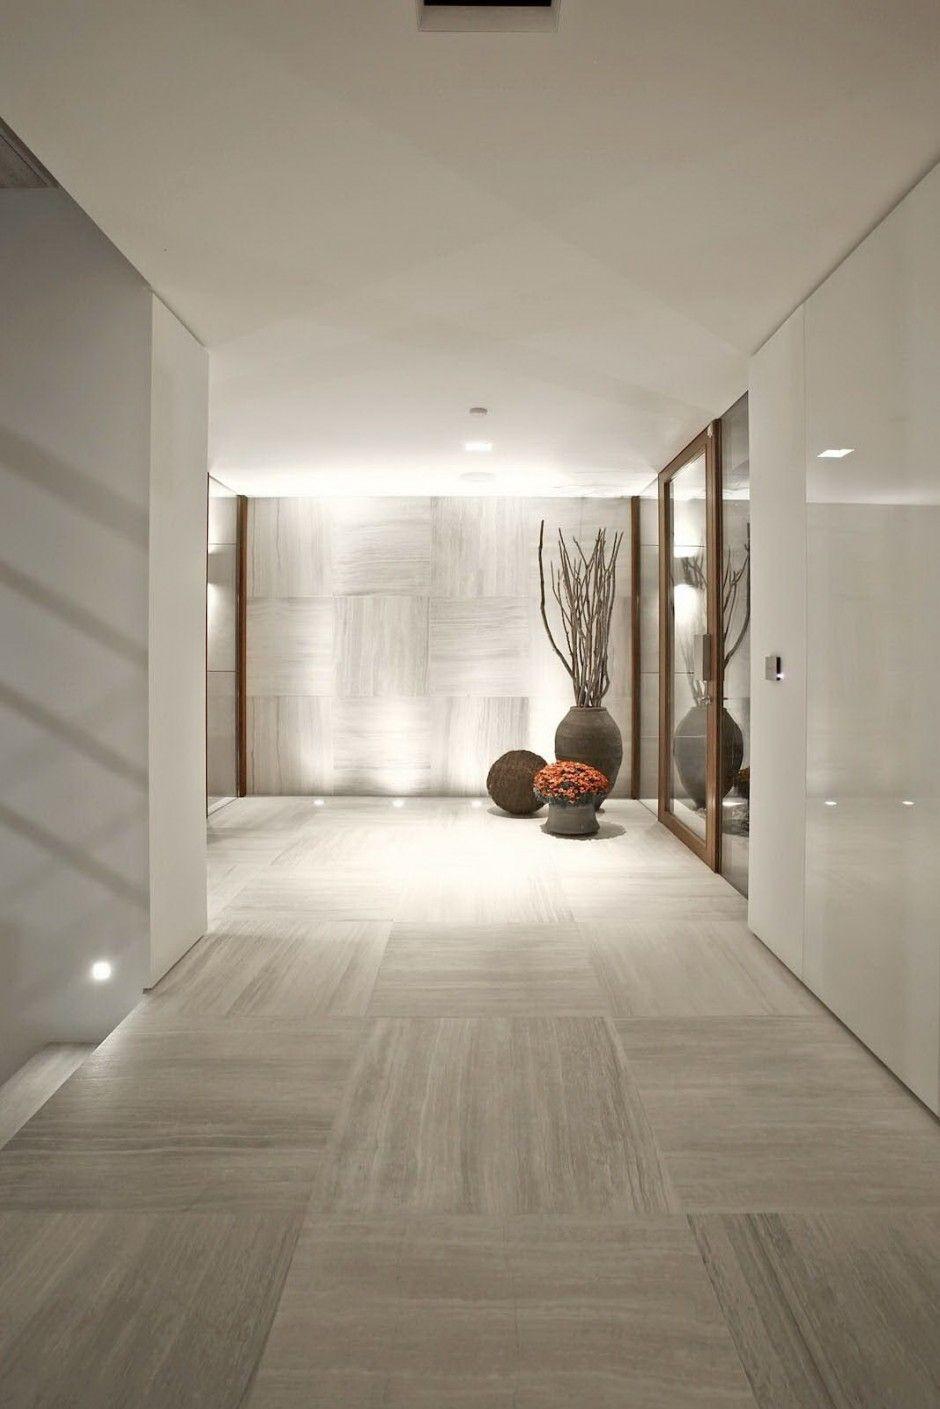 Tanju ozelgins stunning modern s house 212 concept modern living